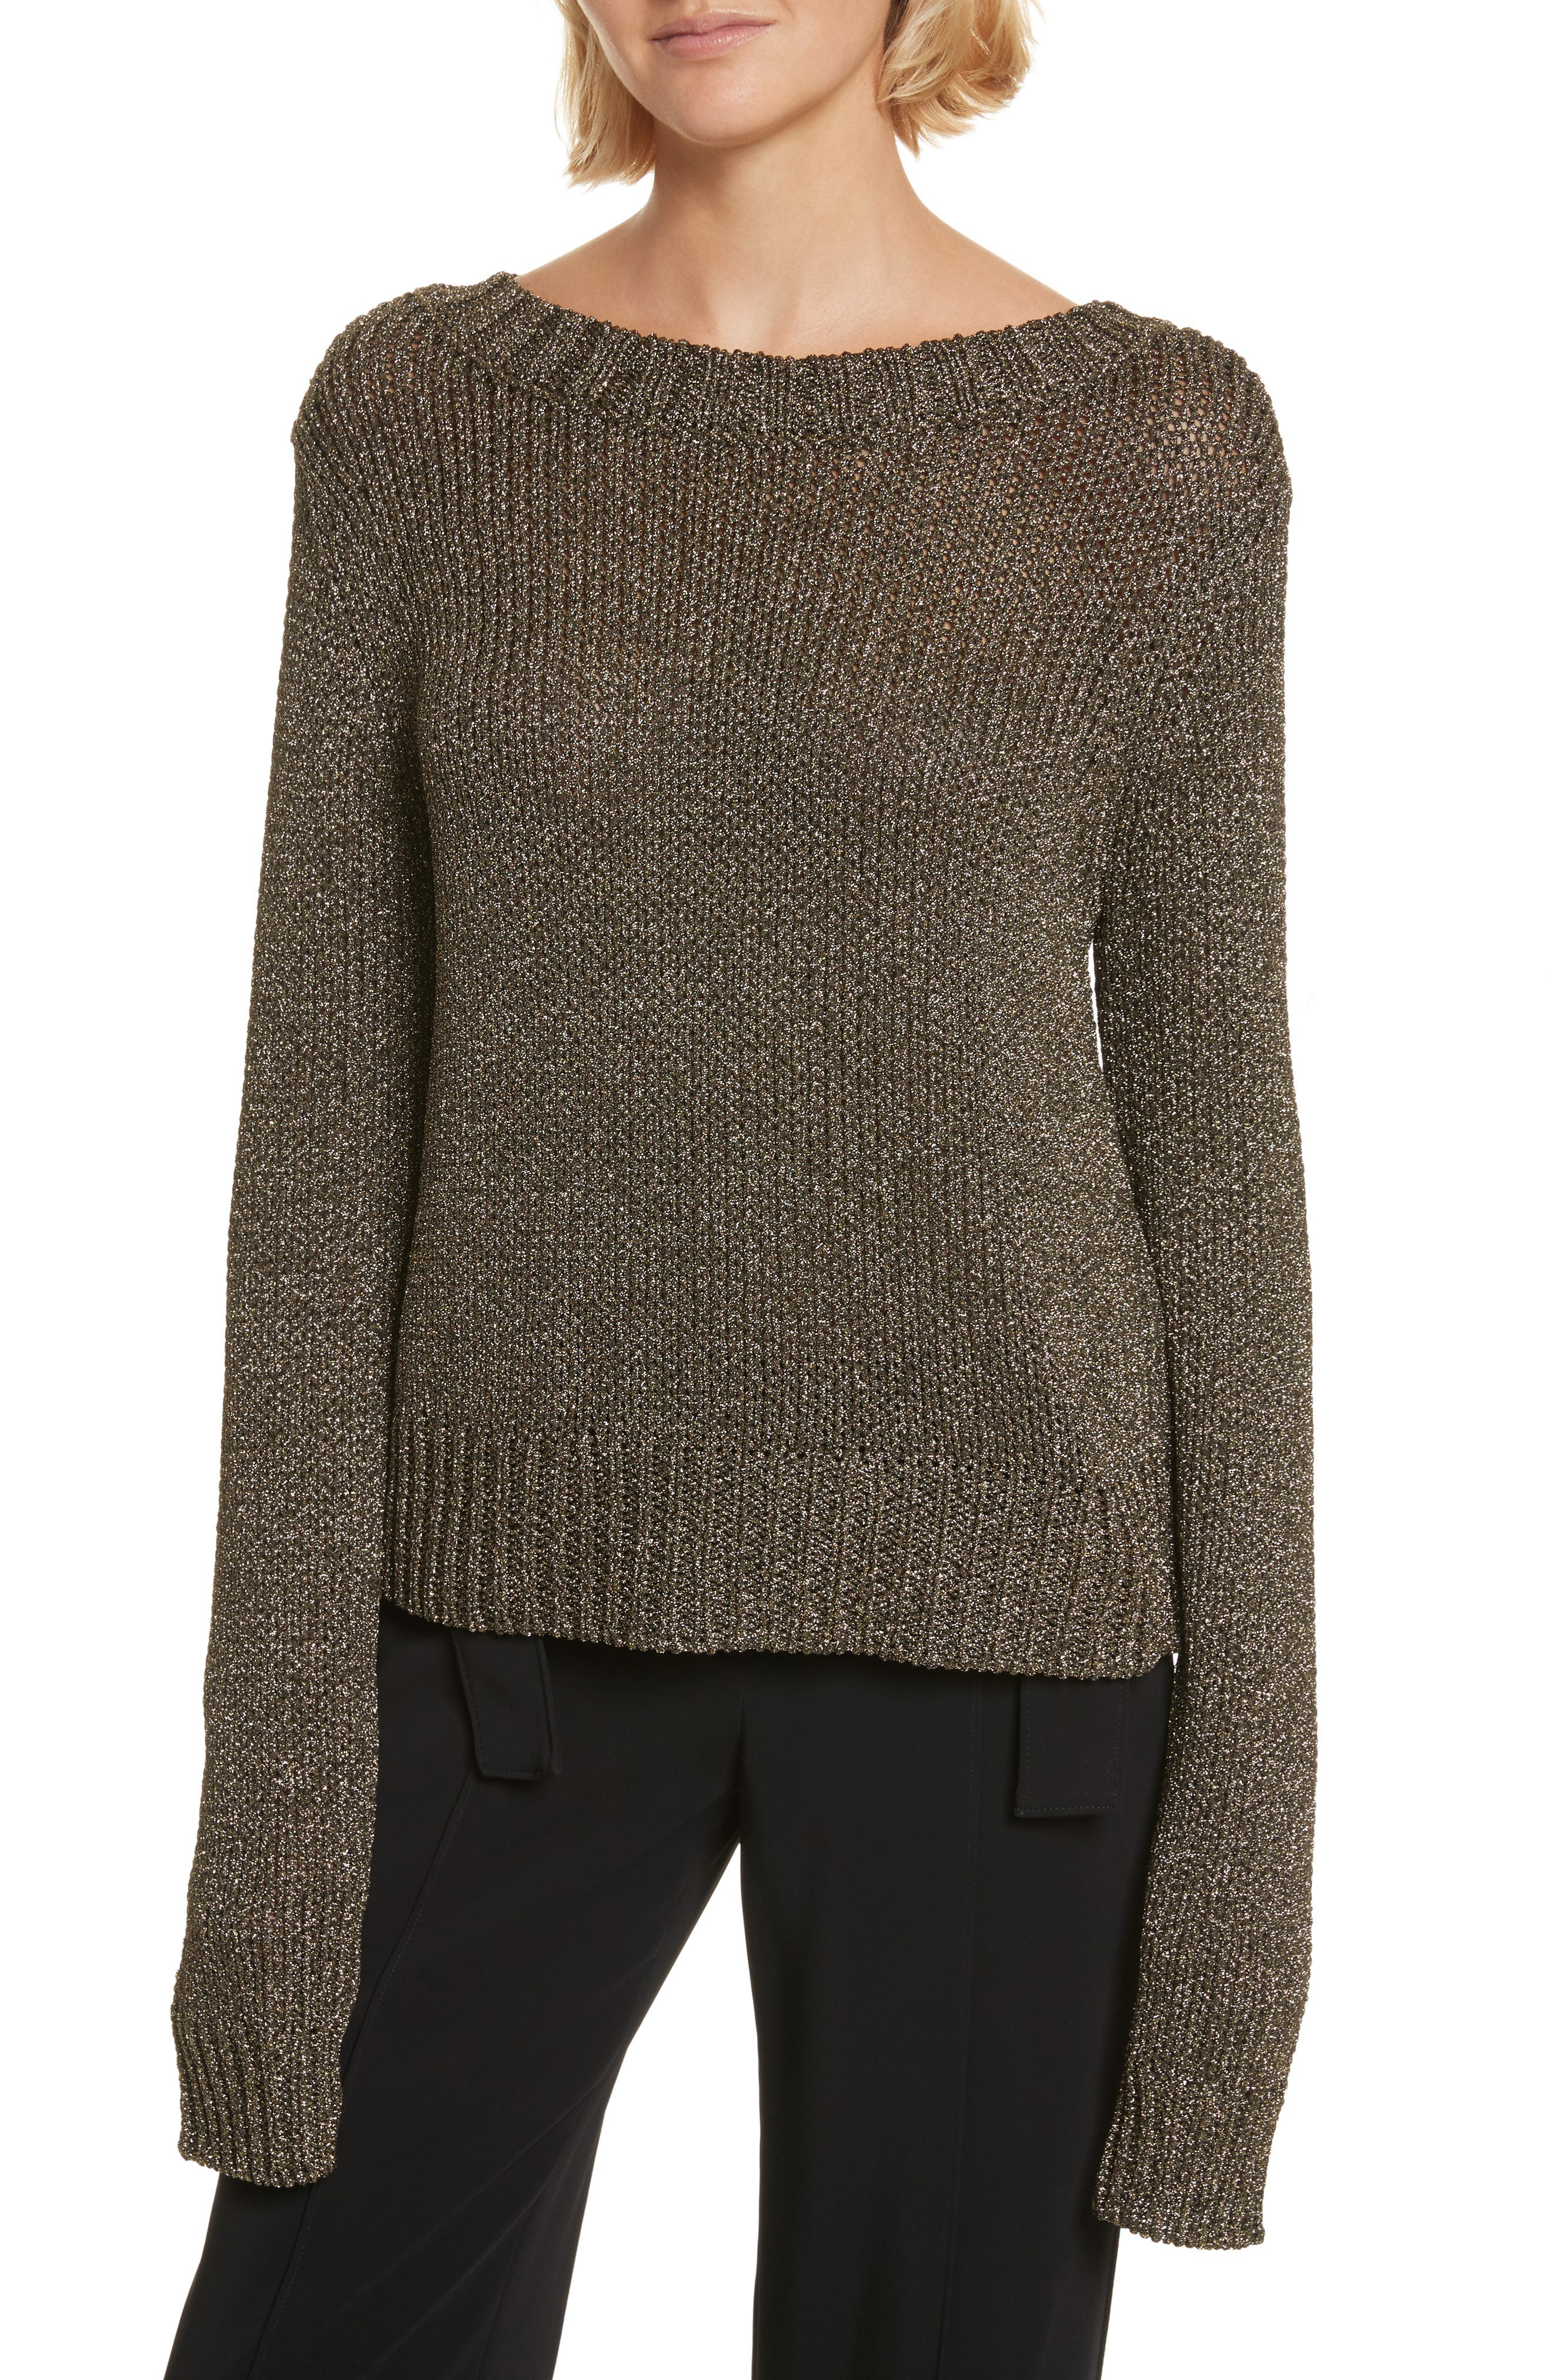 Alternate Image 2  - A.L.C. Marjorie Lace-Up Back Sweater